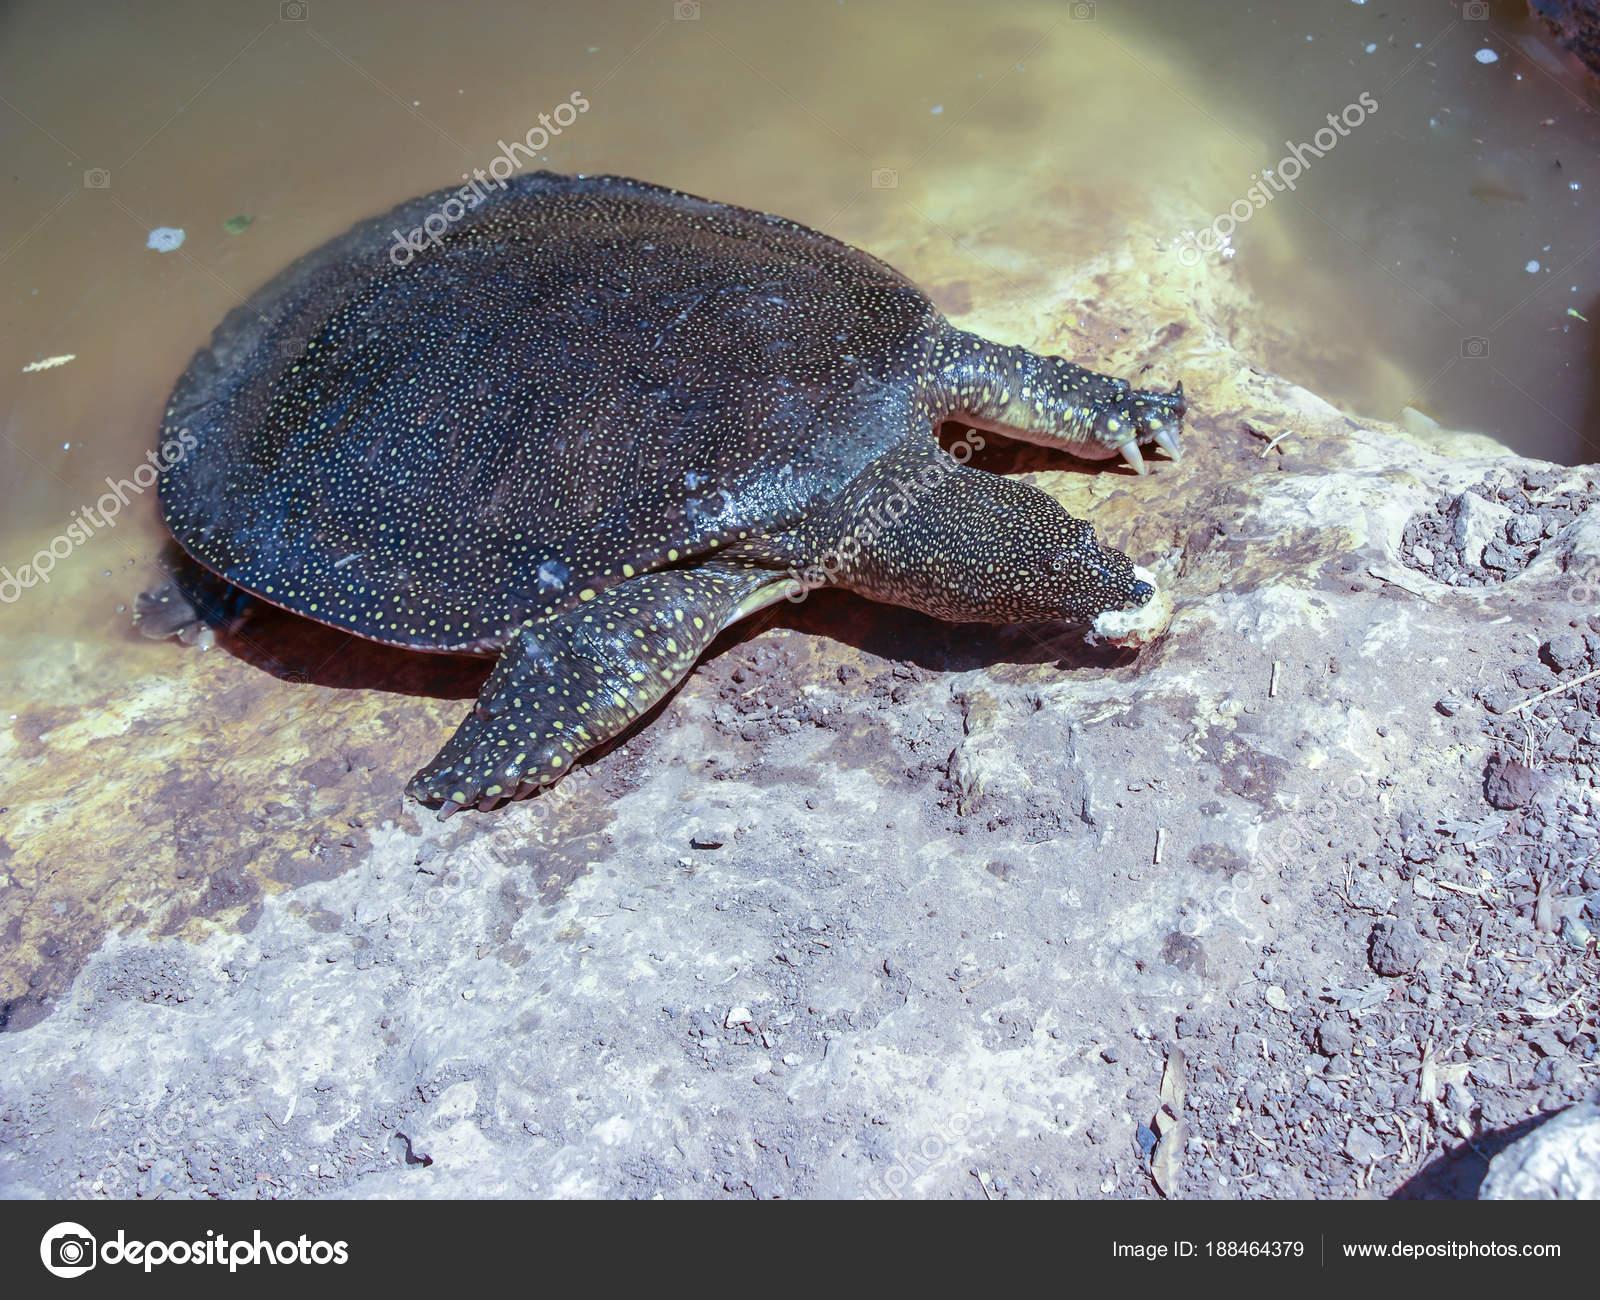 Картинки по запросу Мягкотелая морская черепаха в реке Александр.